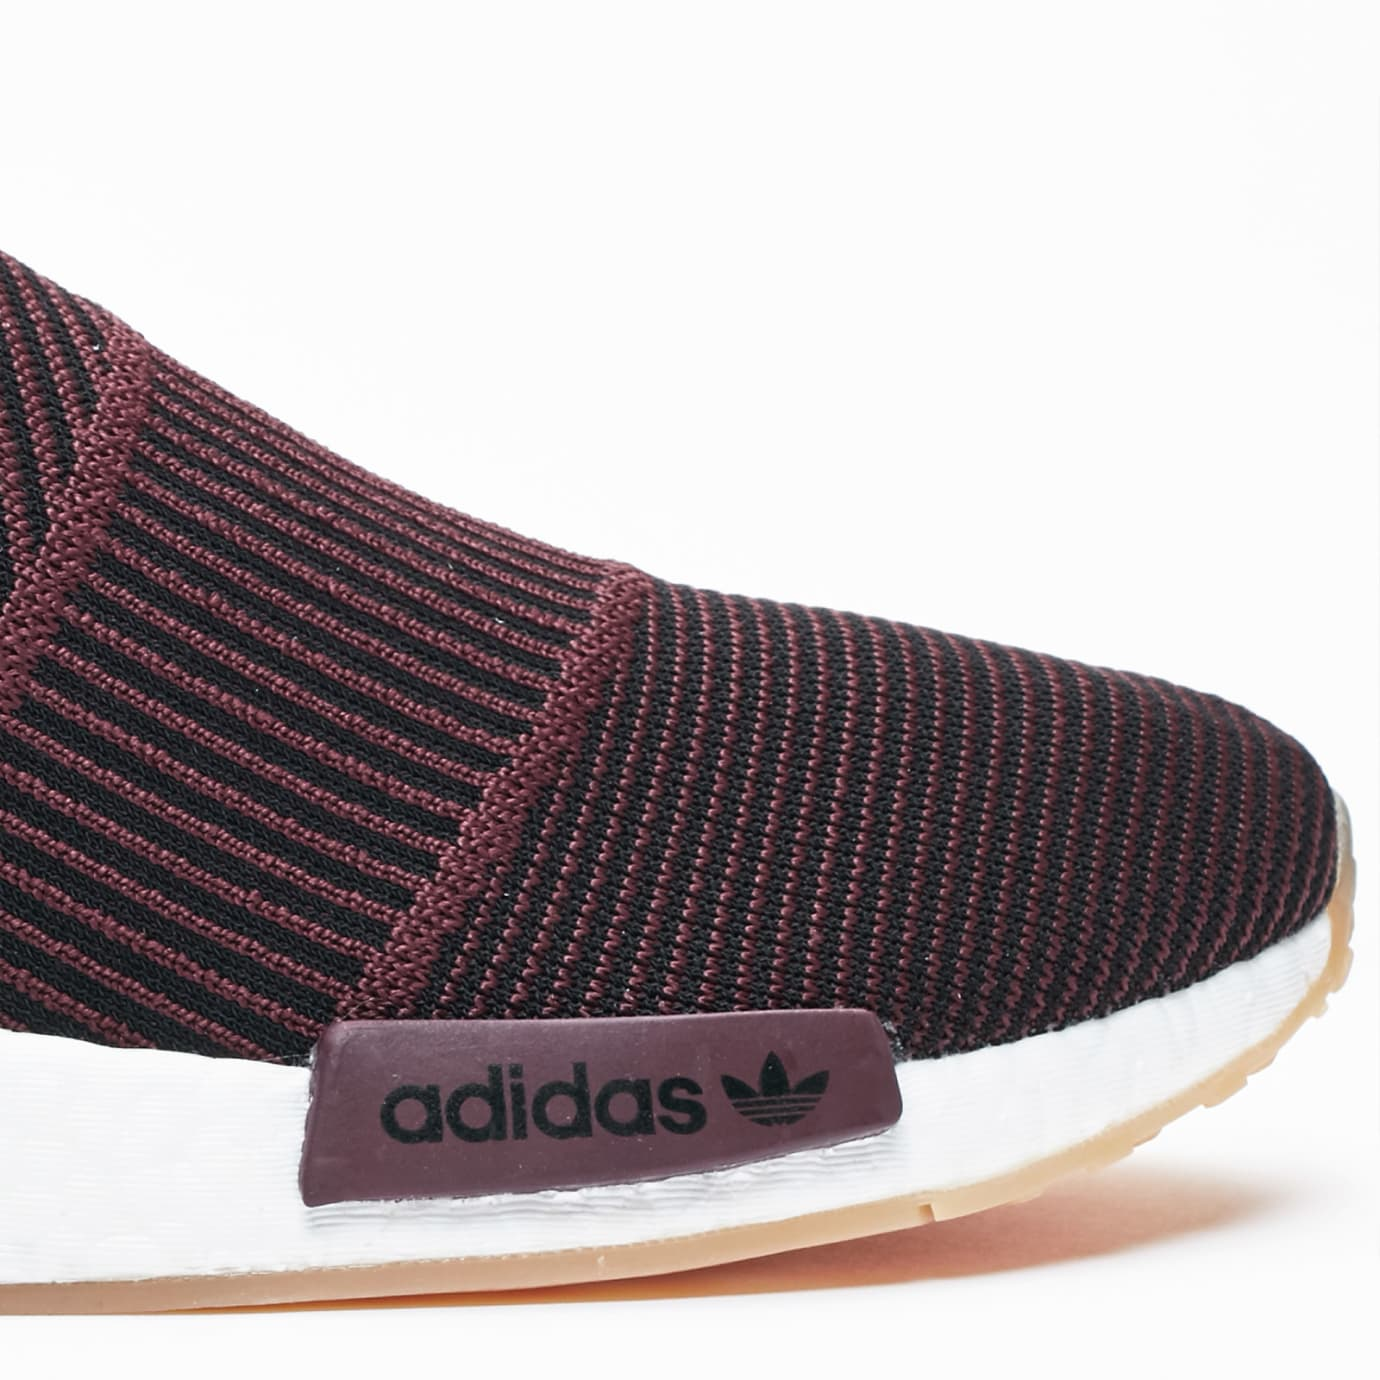 Adidas NMD_CS1 Gore-Tex Primeknit 'SNS Exclusive' AQ0364 (Toe)